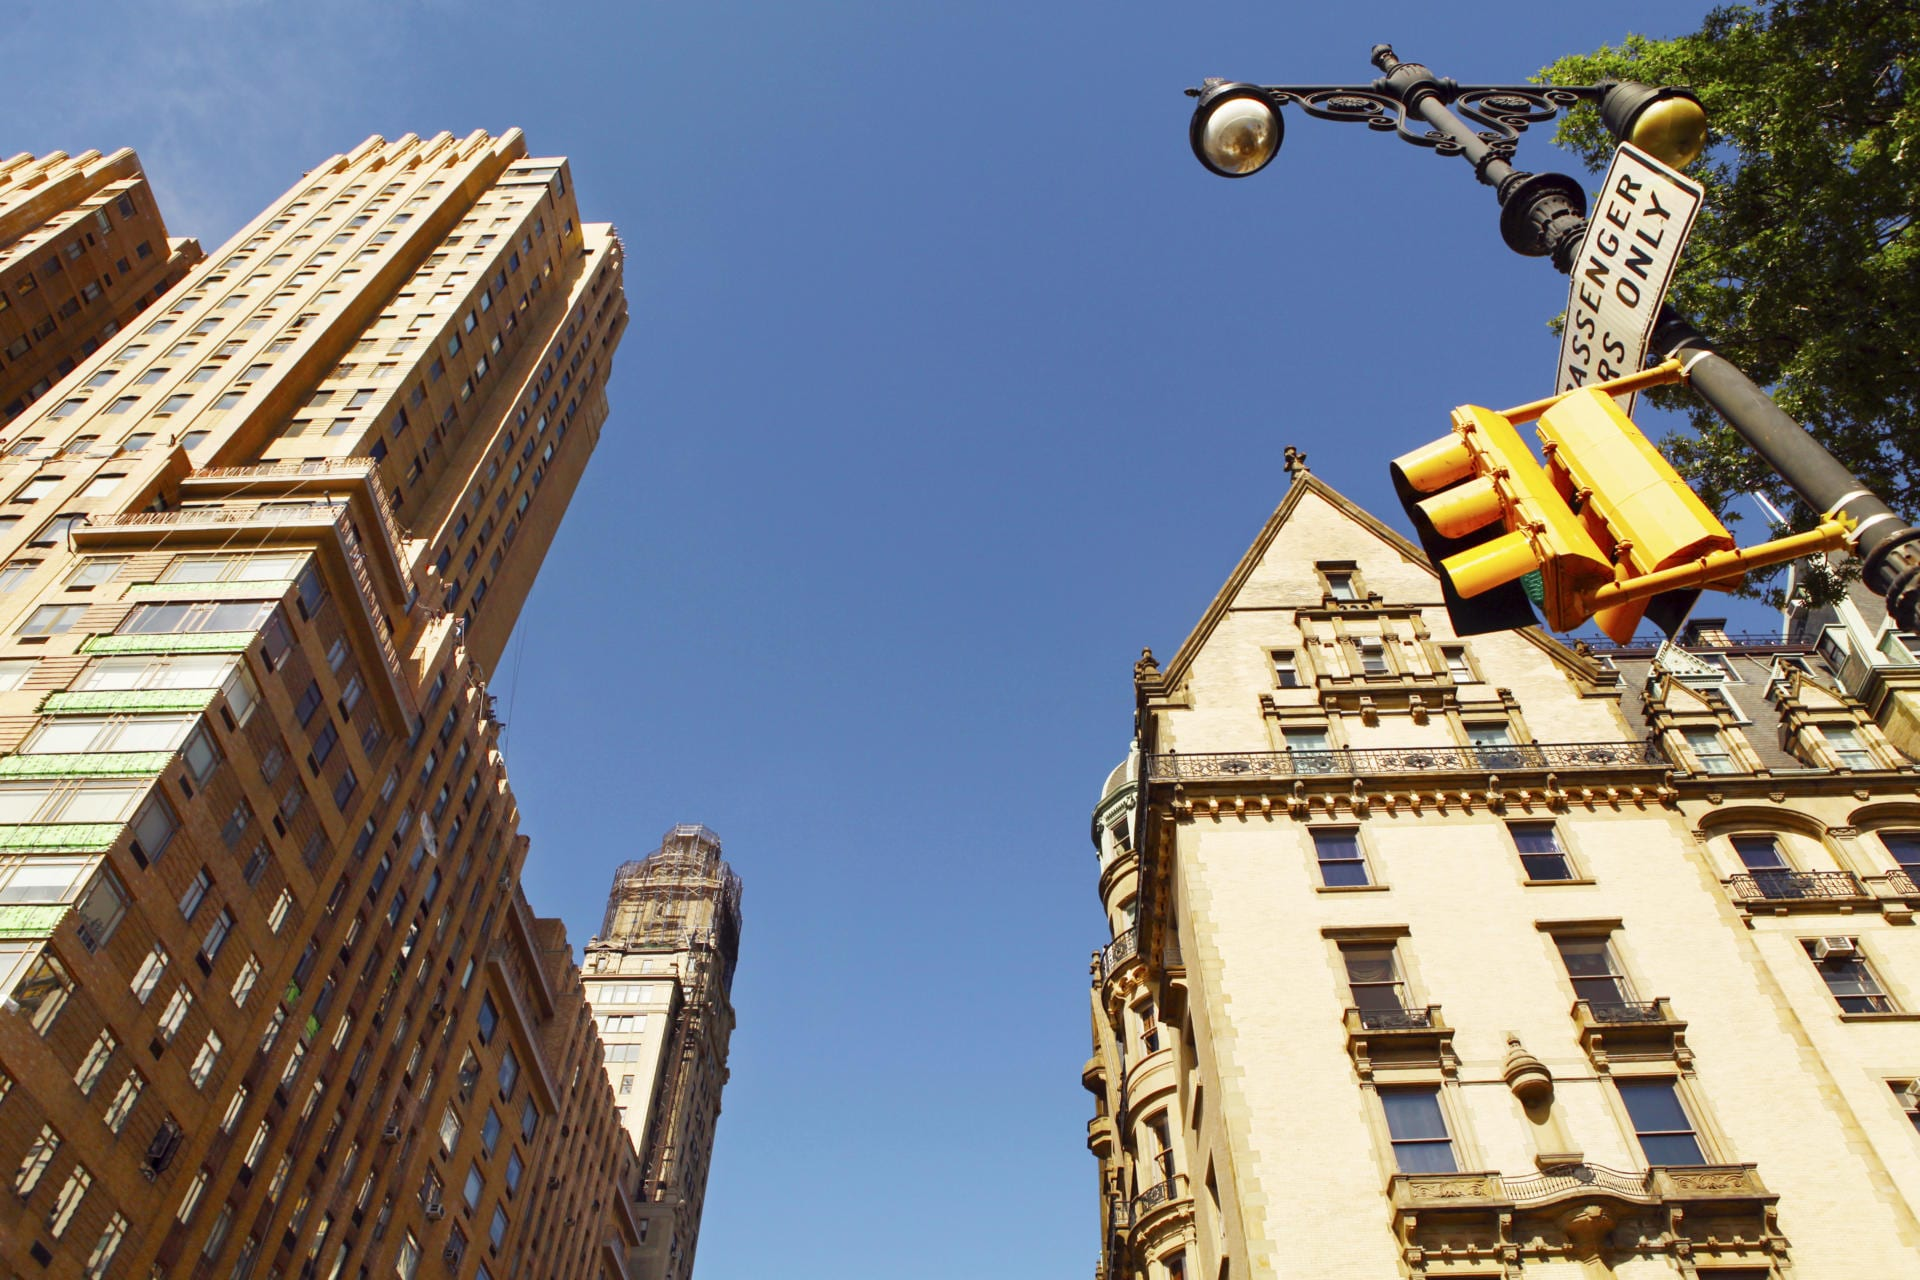 Buffalo Website Design Company - Low angle view of Buffalo, NY buildings against clear blue sky -